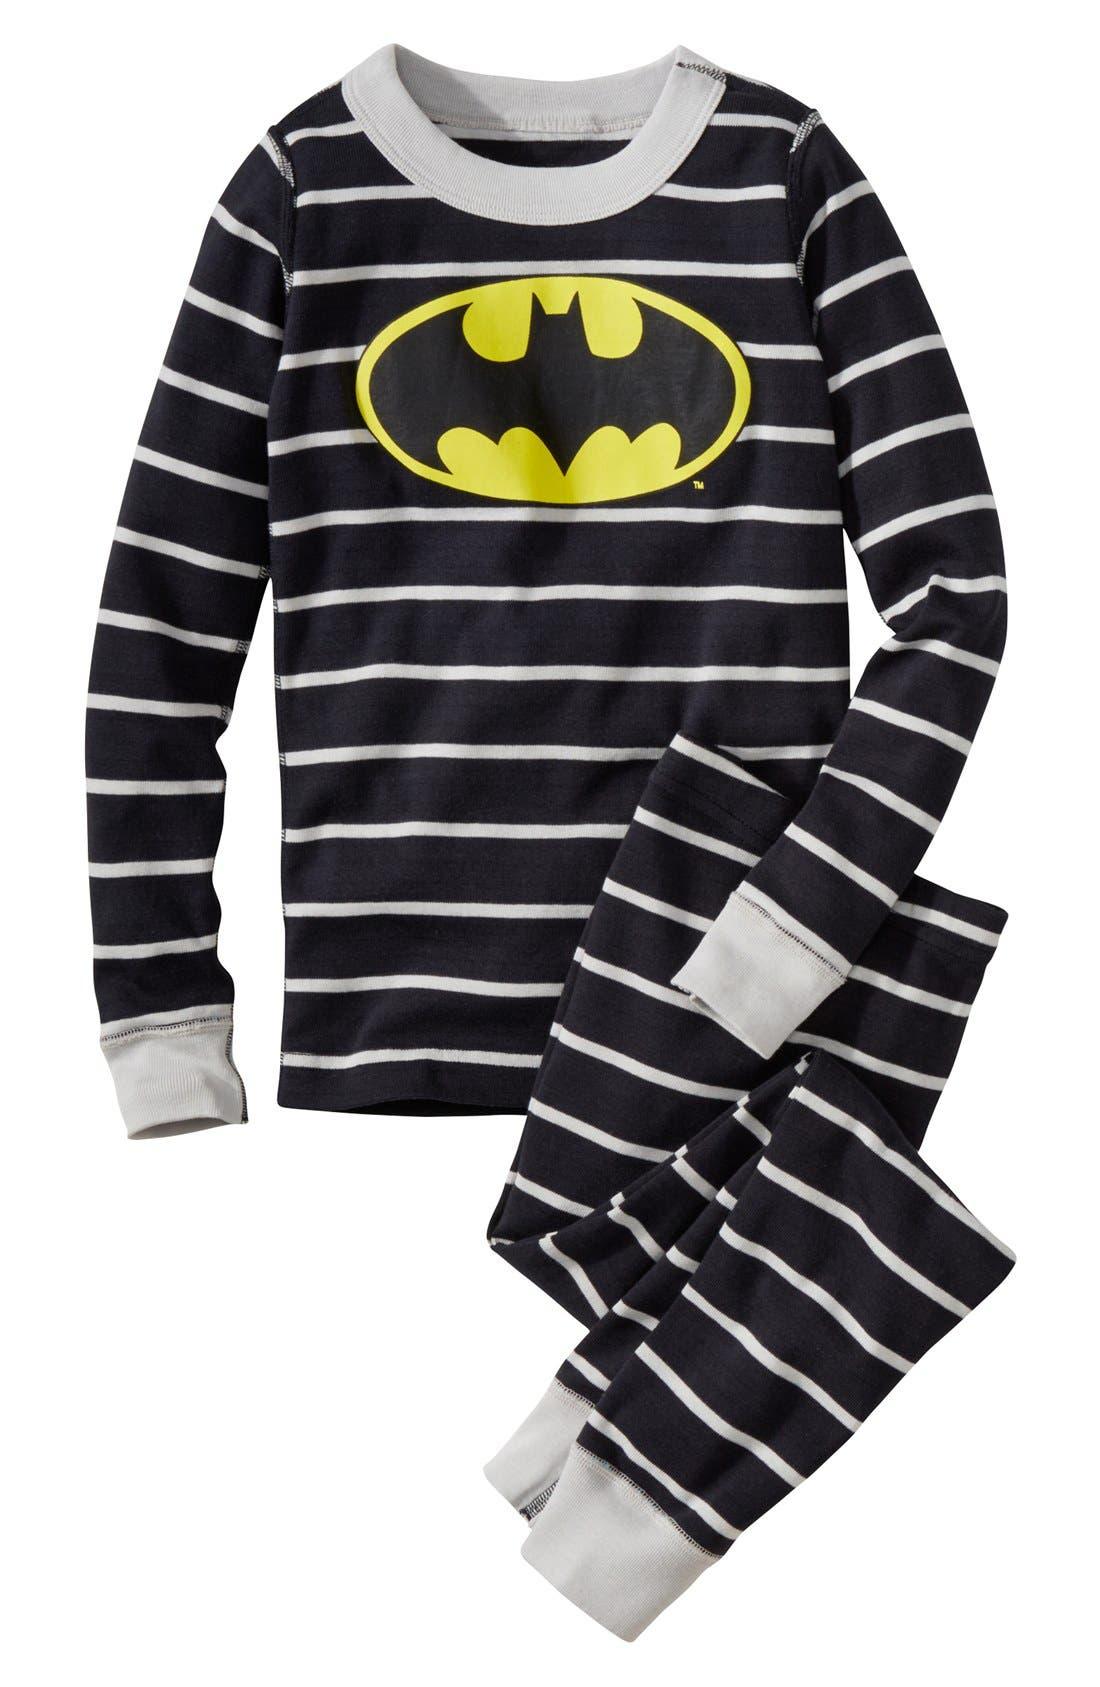 'DC Comics<sup>™</sup> Batman' Organic Cotton Fitted Two-Piece Pajamas, Main, color, 005